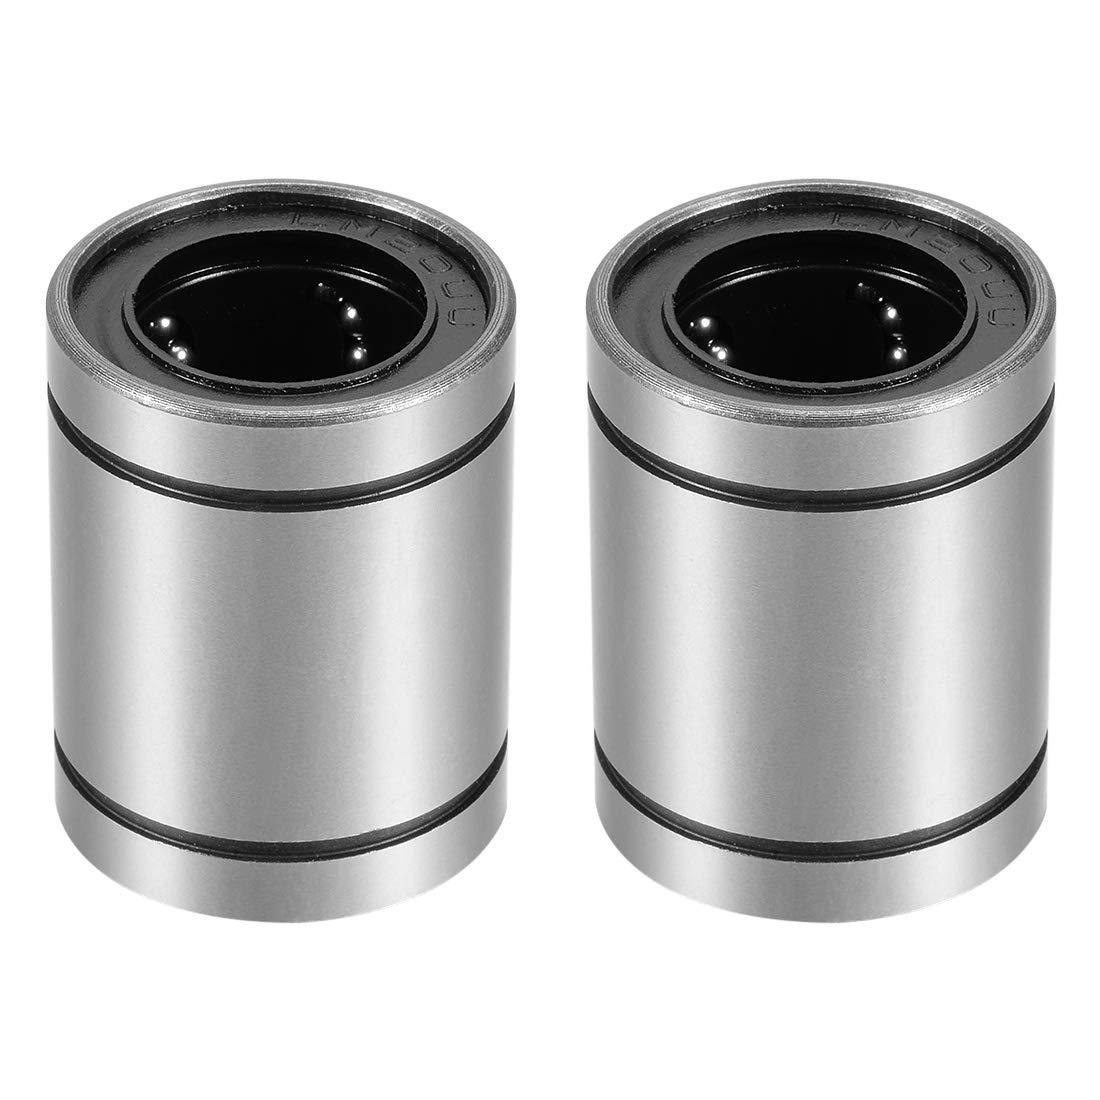 4 CNC linear slide guide Cylinder shaft 20mm rod LM20UU ball bearing bushing